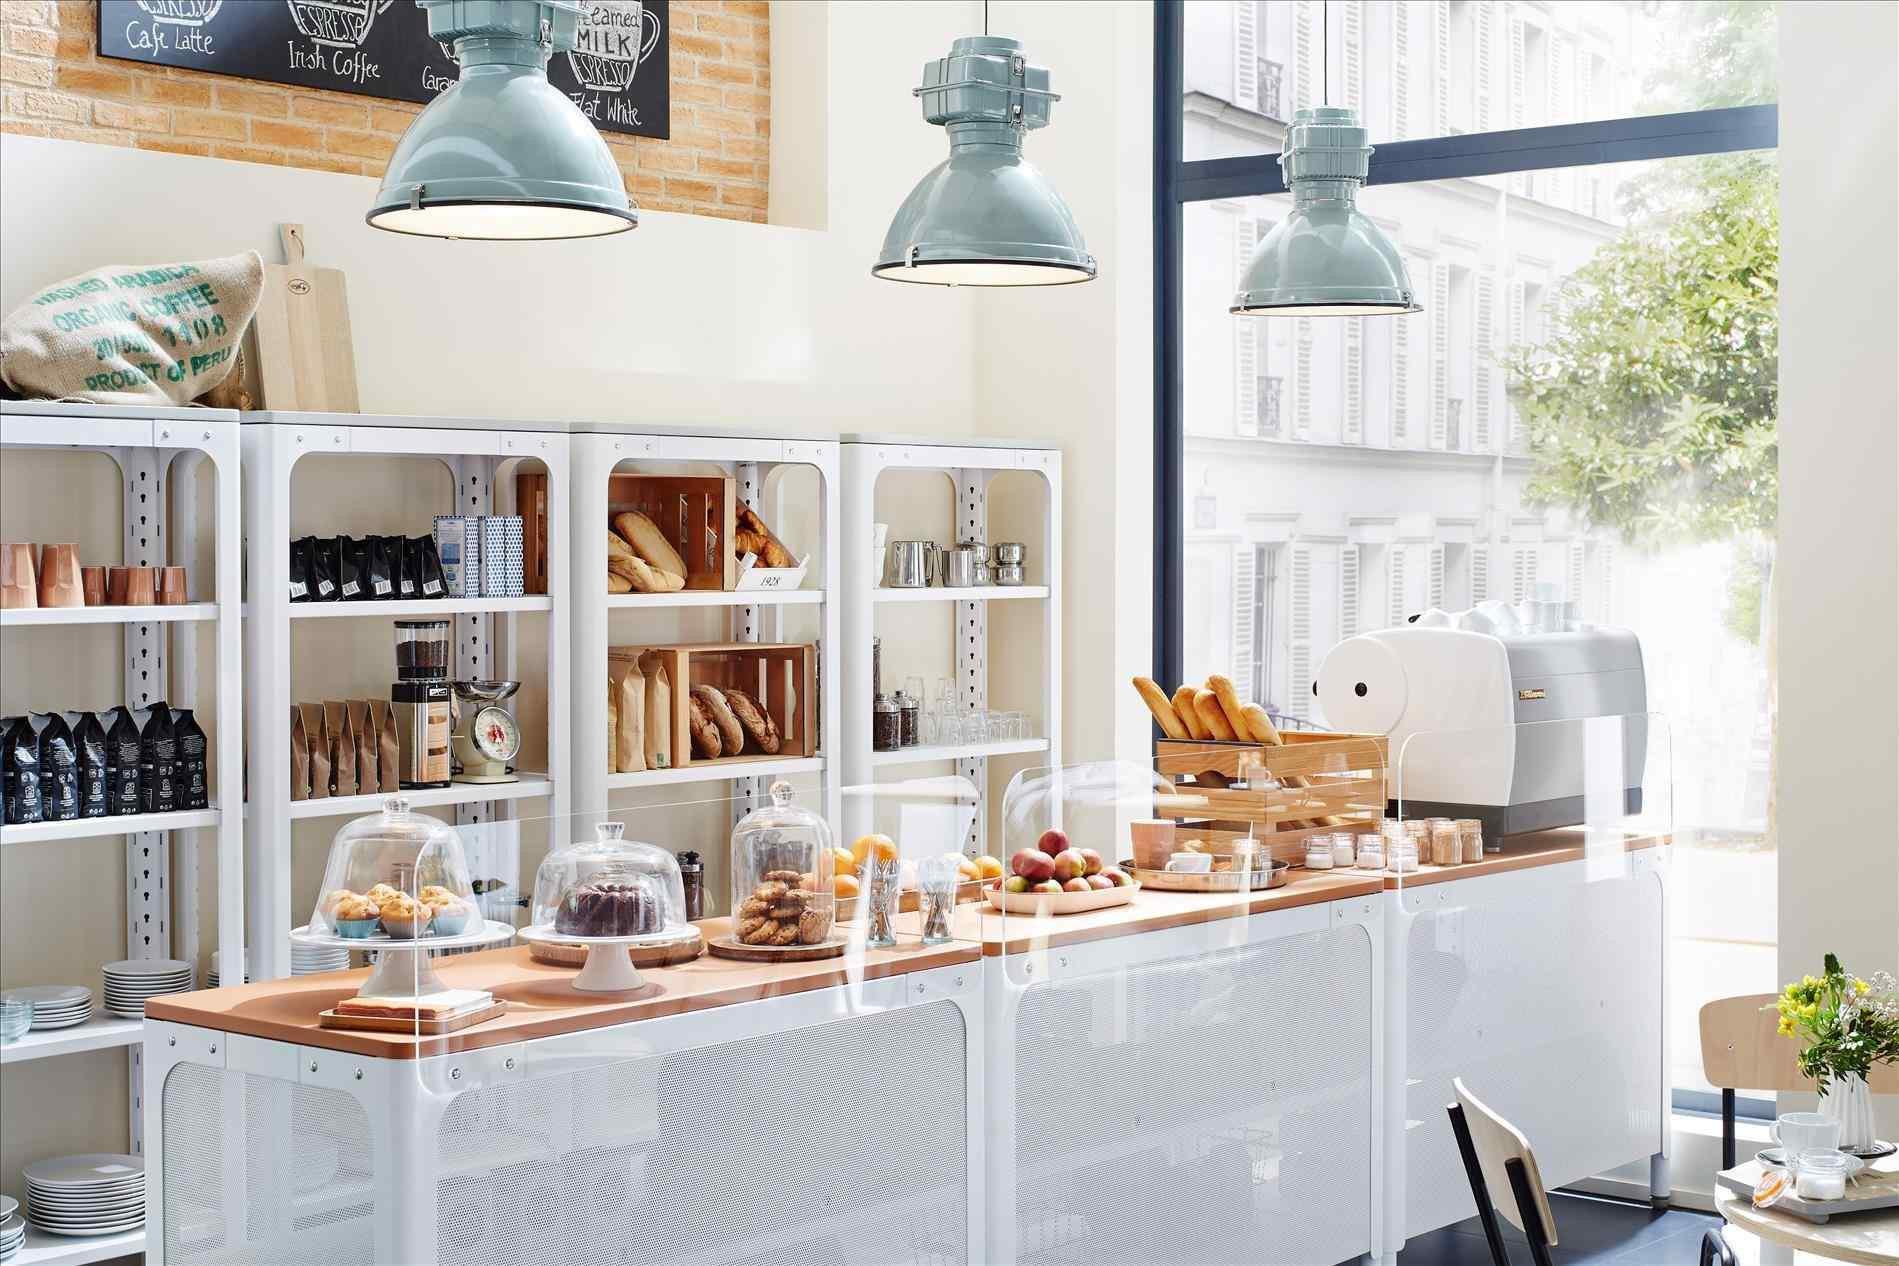 Best ideas about Coffee Kitchen Decor Walmart . Save or Pin Bistro Themed Kitchen Decor Now.